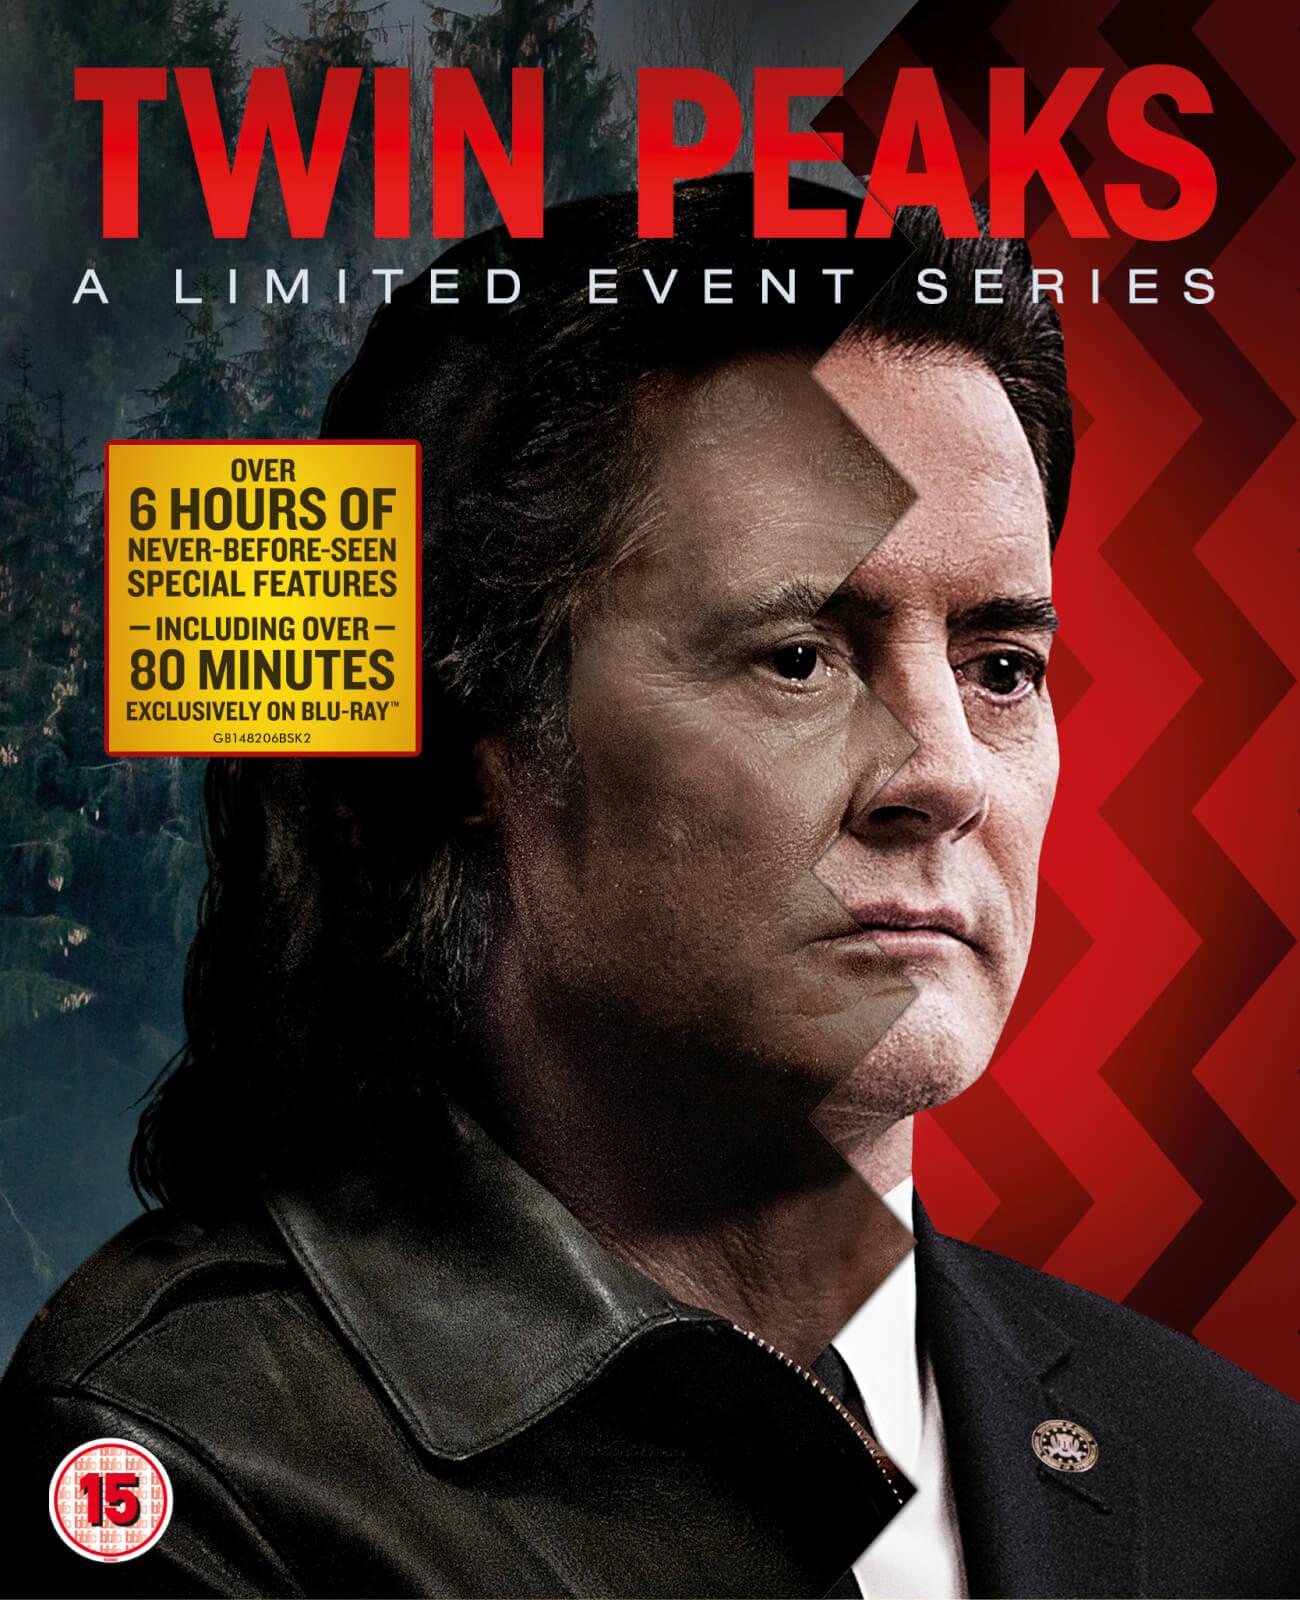 Twin Peaks Season 3 - £9.99 @ Amazon (digital purchase)